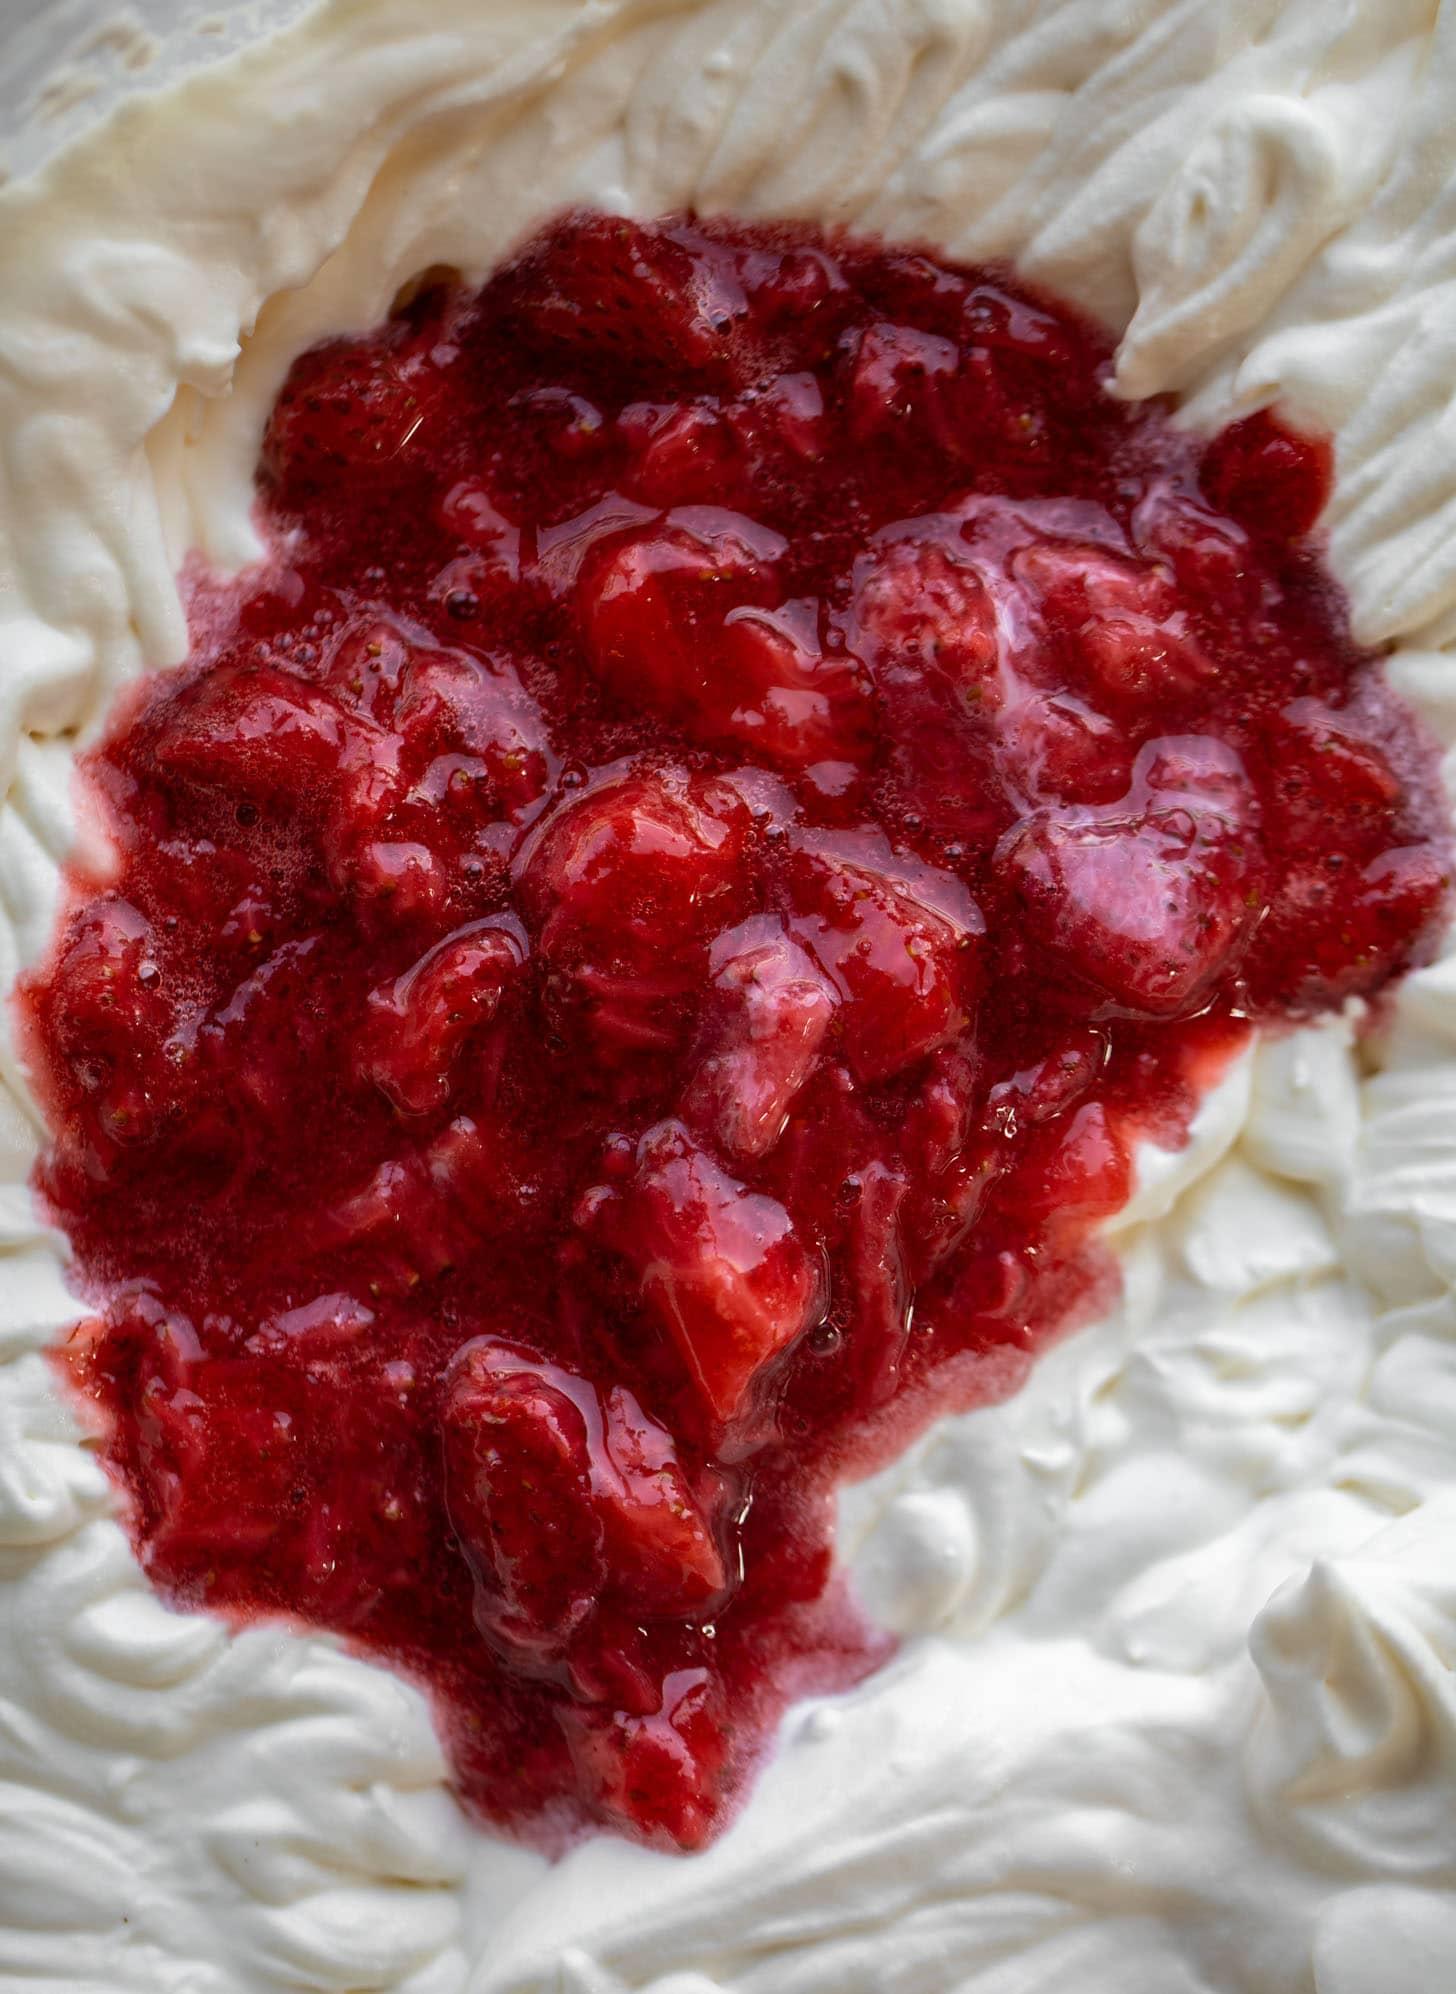 strawberry sauce in no churn ice cream